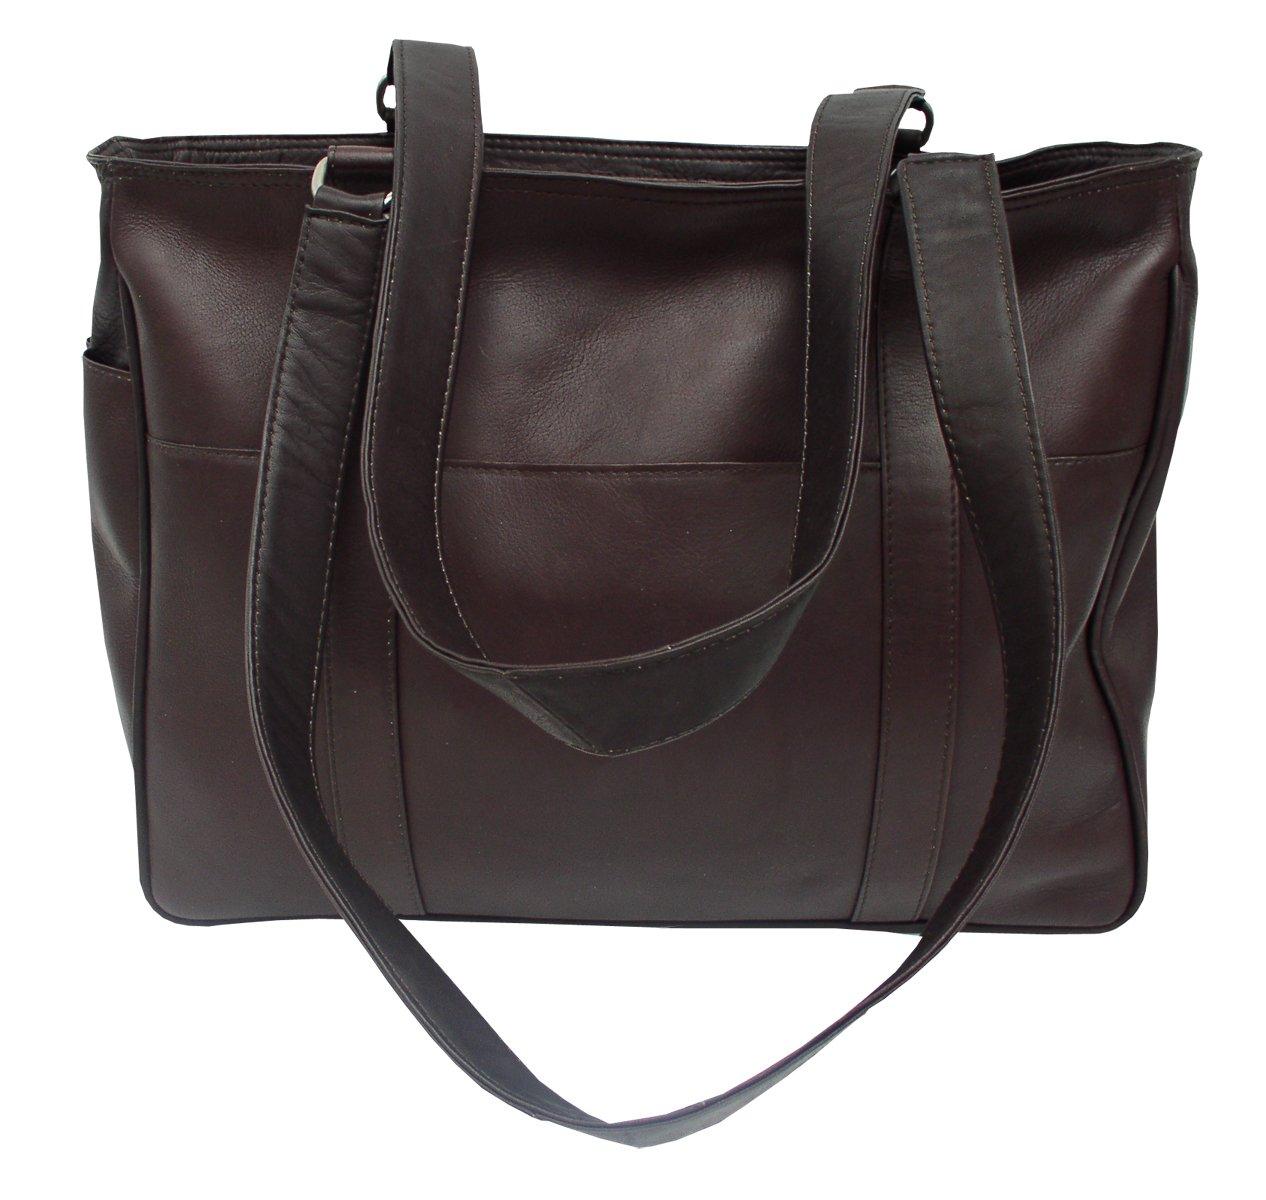 6446b594ff Amazon.com  Piel Leather Small Shopping Bag